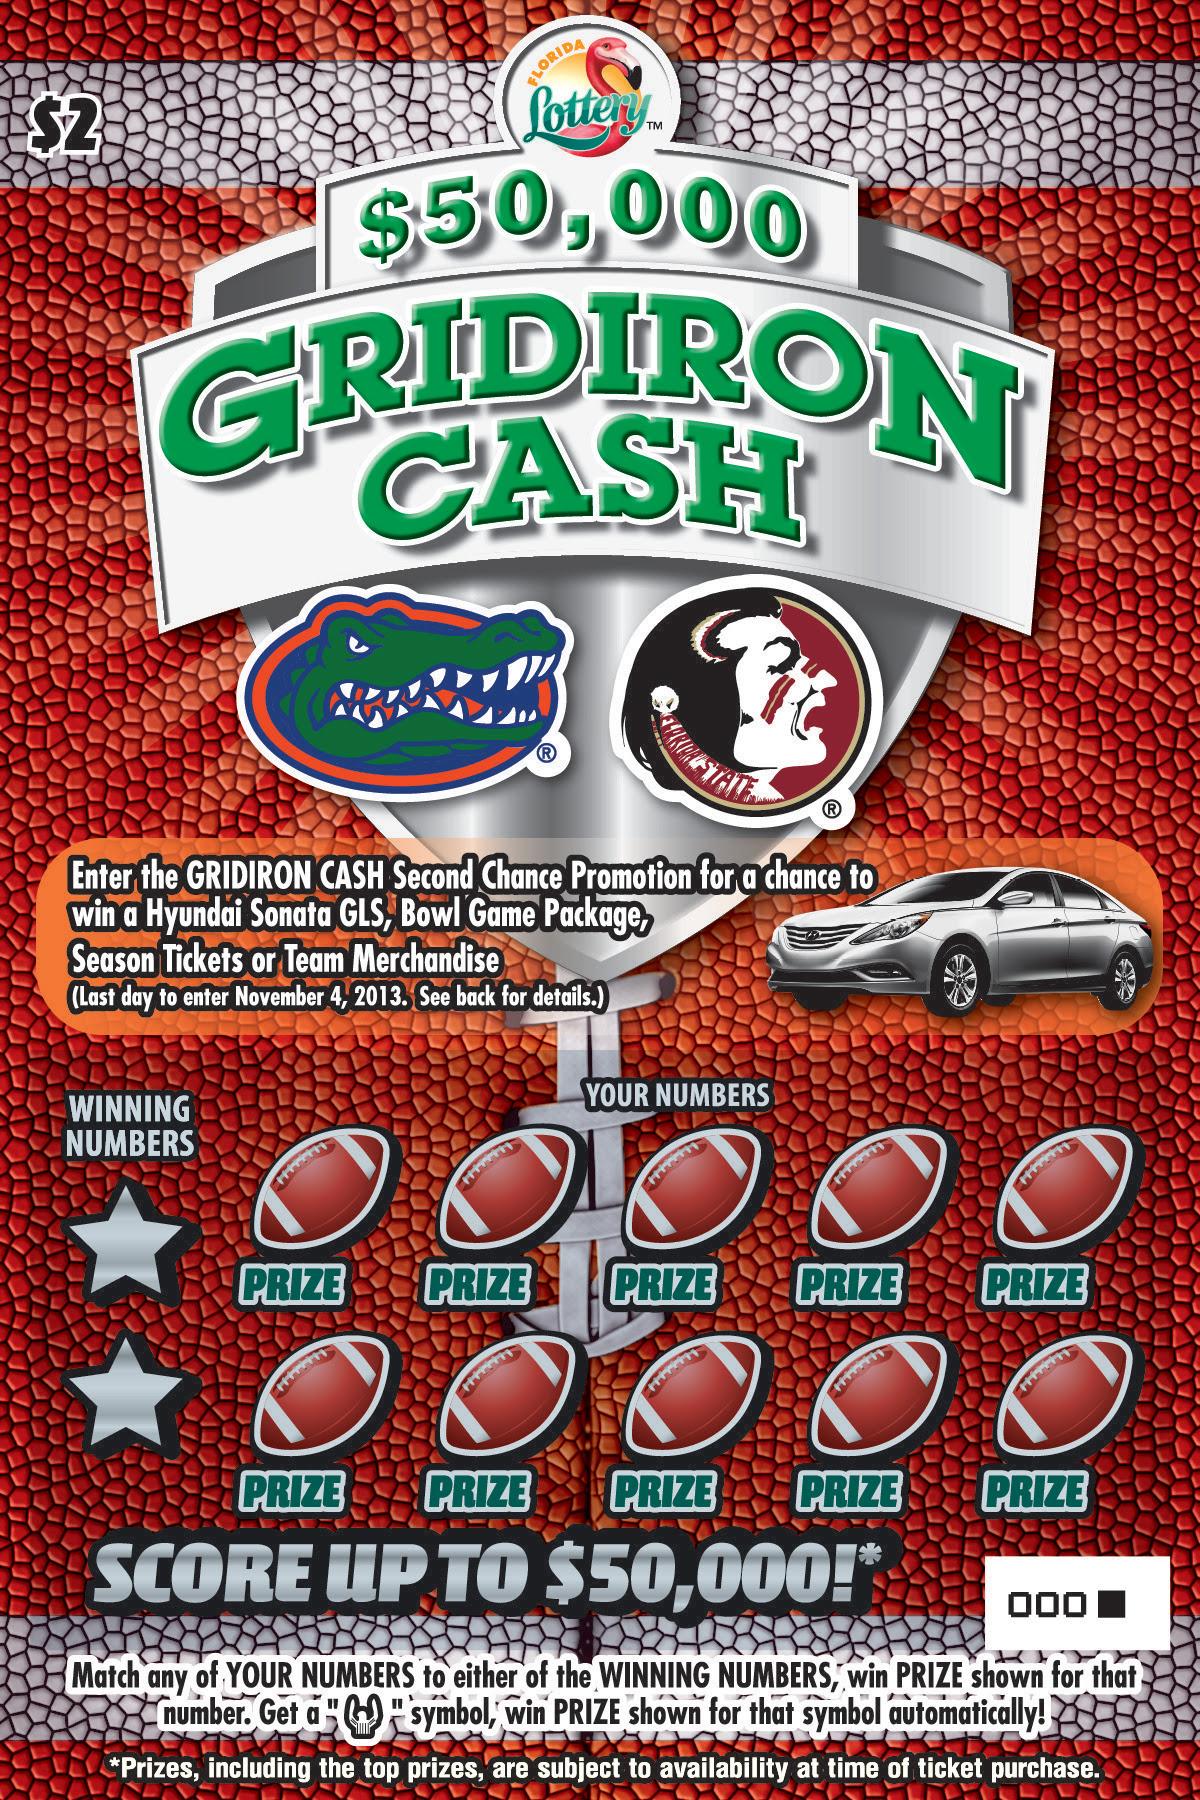 Florida Lottery scratch-off game - southflorida.com